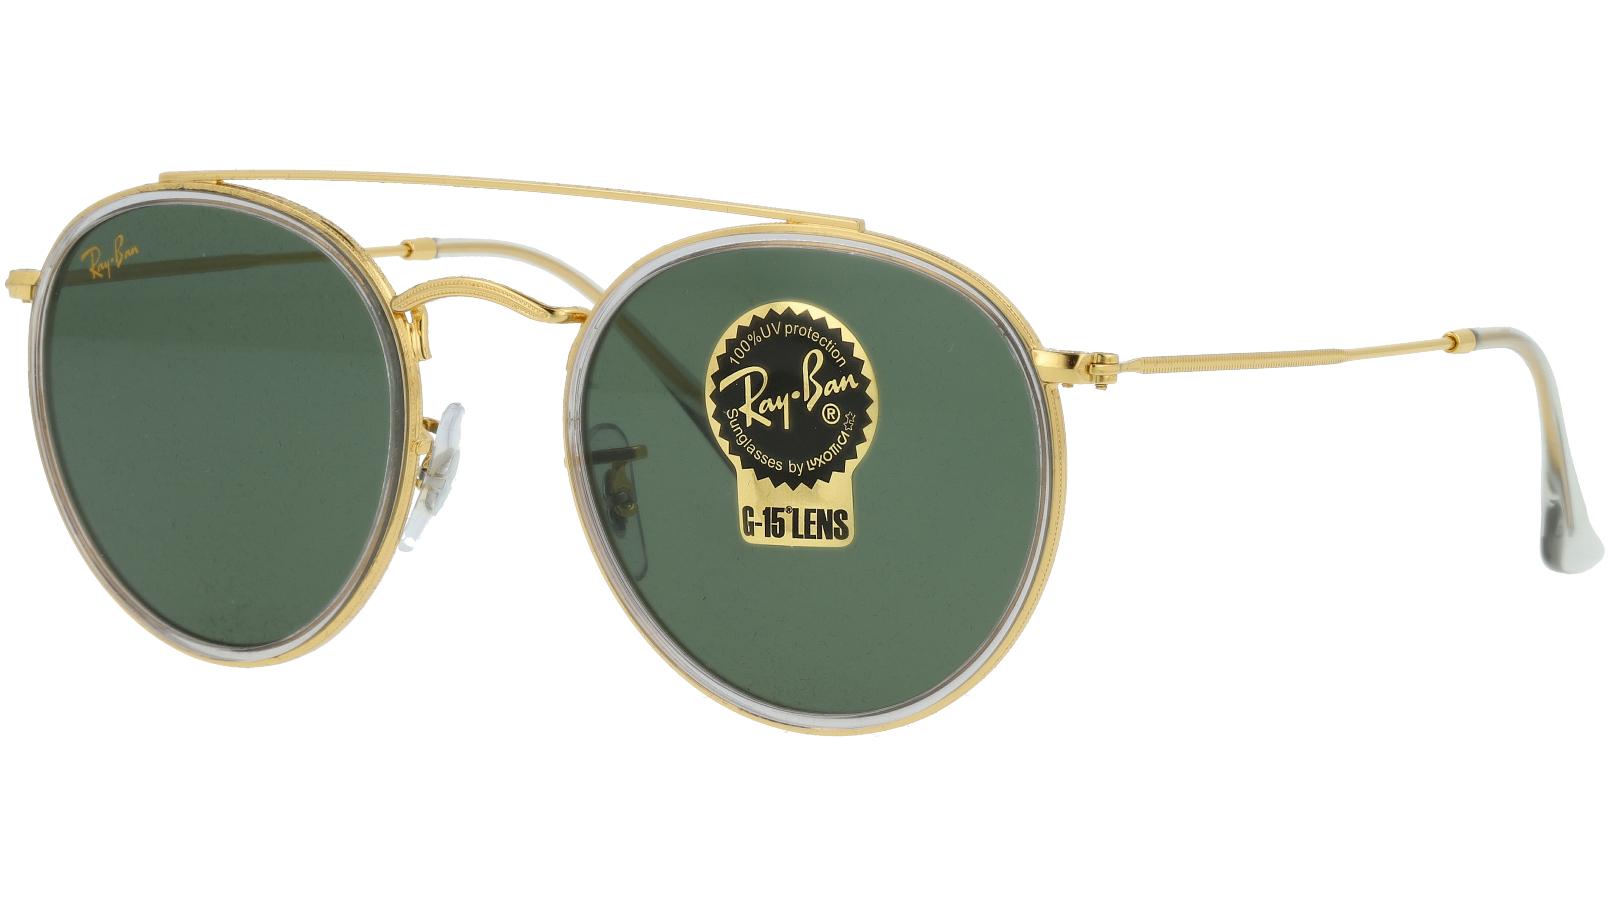 Ray-Ban RB3647N 921031 51 LEGEND Sunglasses